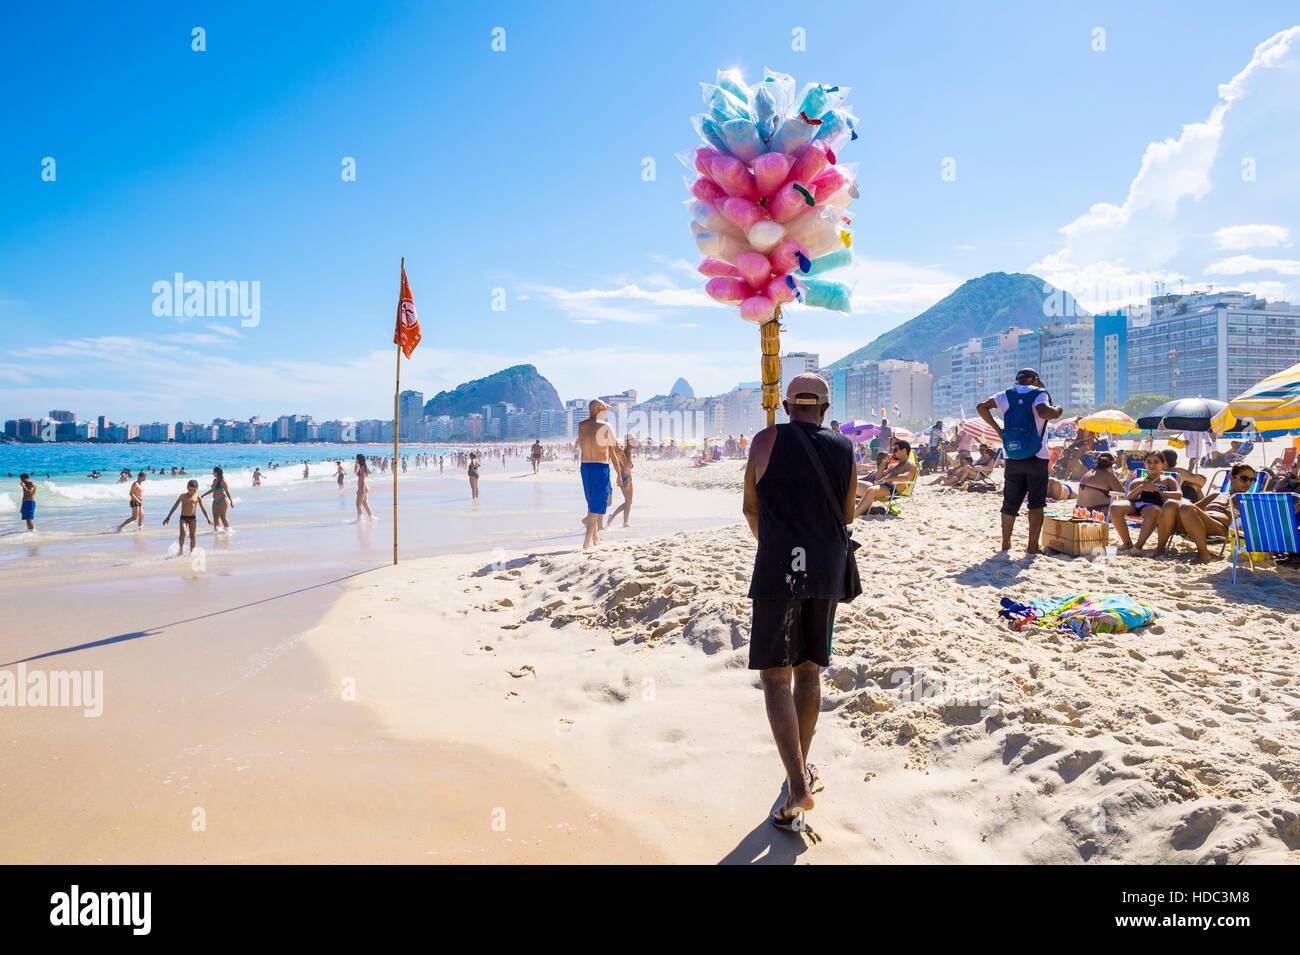 RIO DE JANEIRO - FEBRUARY 27, 2016: Brazilian beach vendor selling cotton candy floss approaches customers on Copacabana. - Stock Image